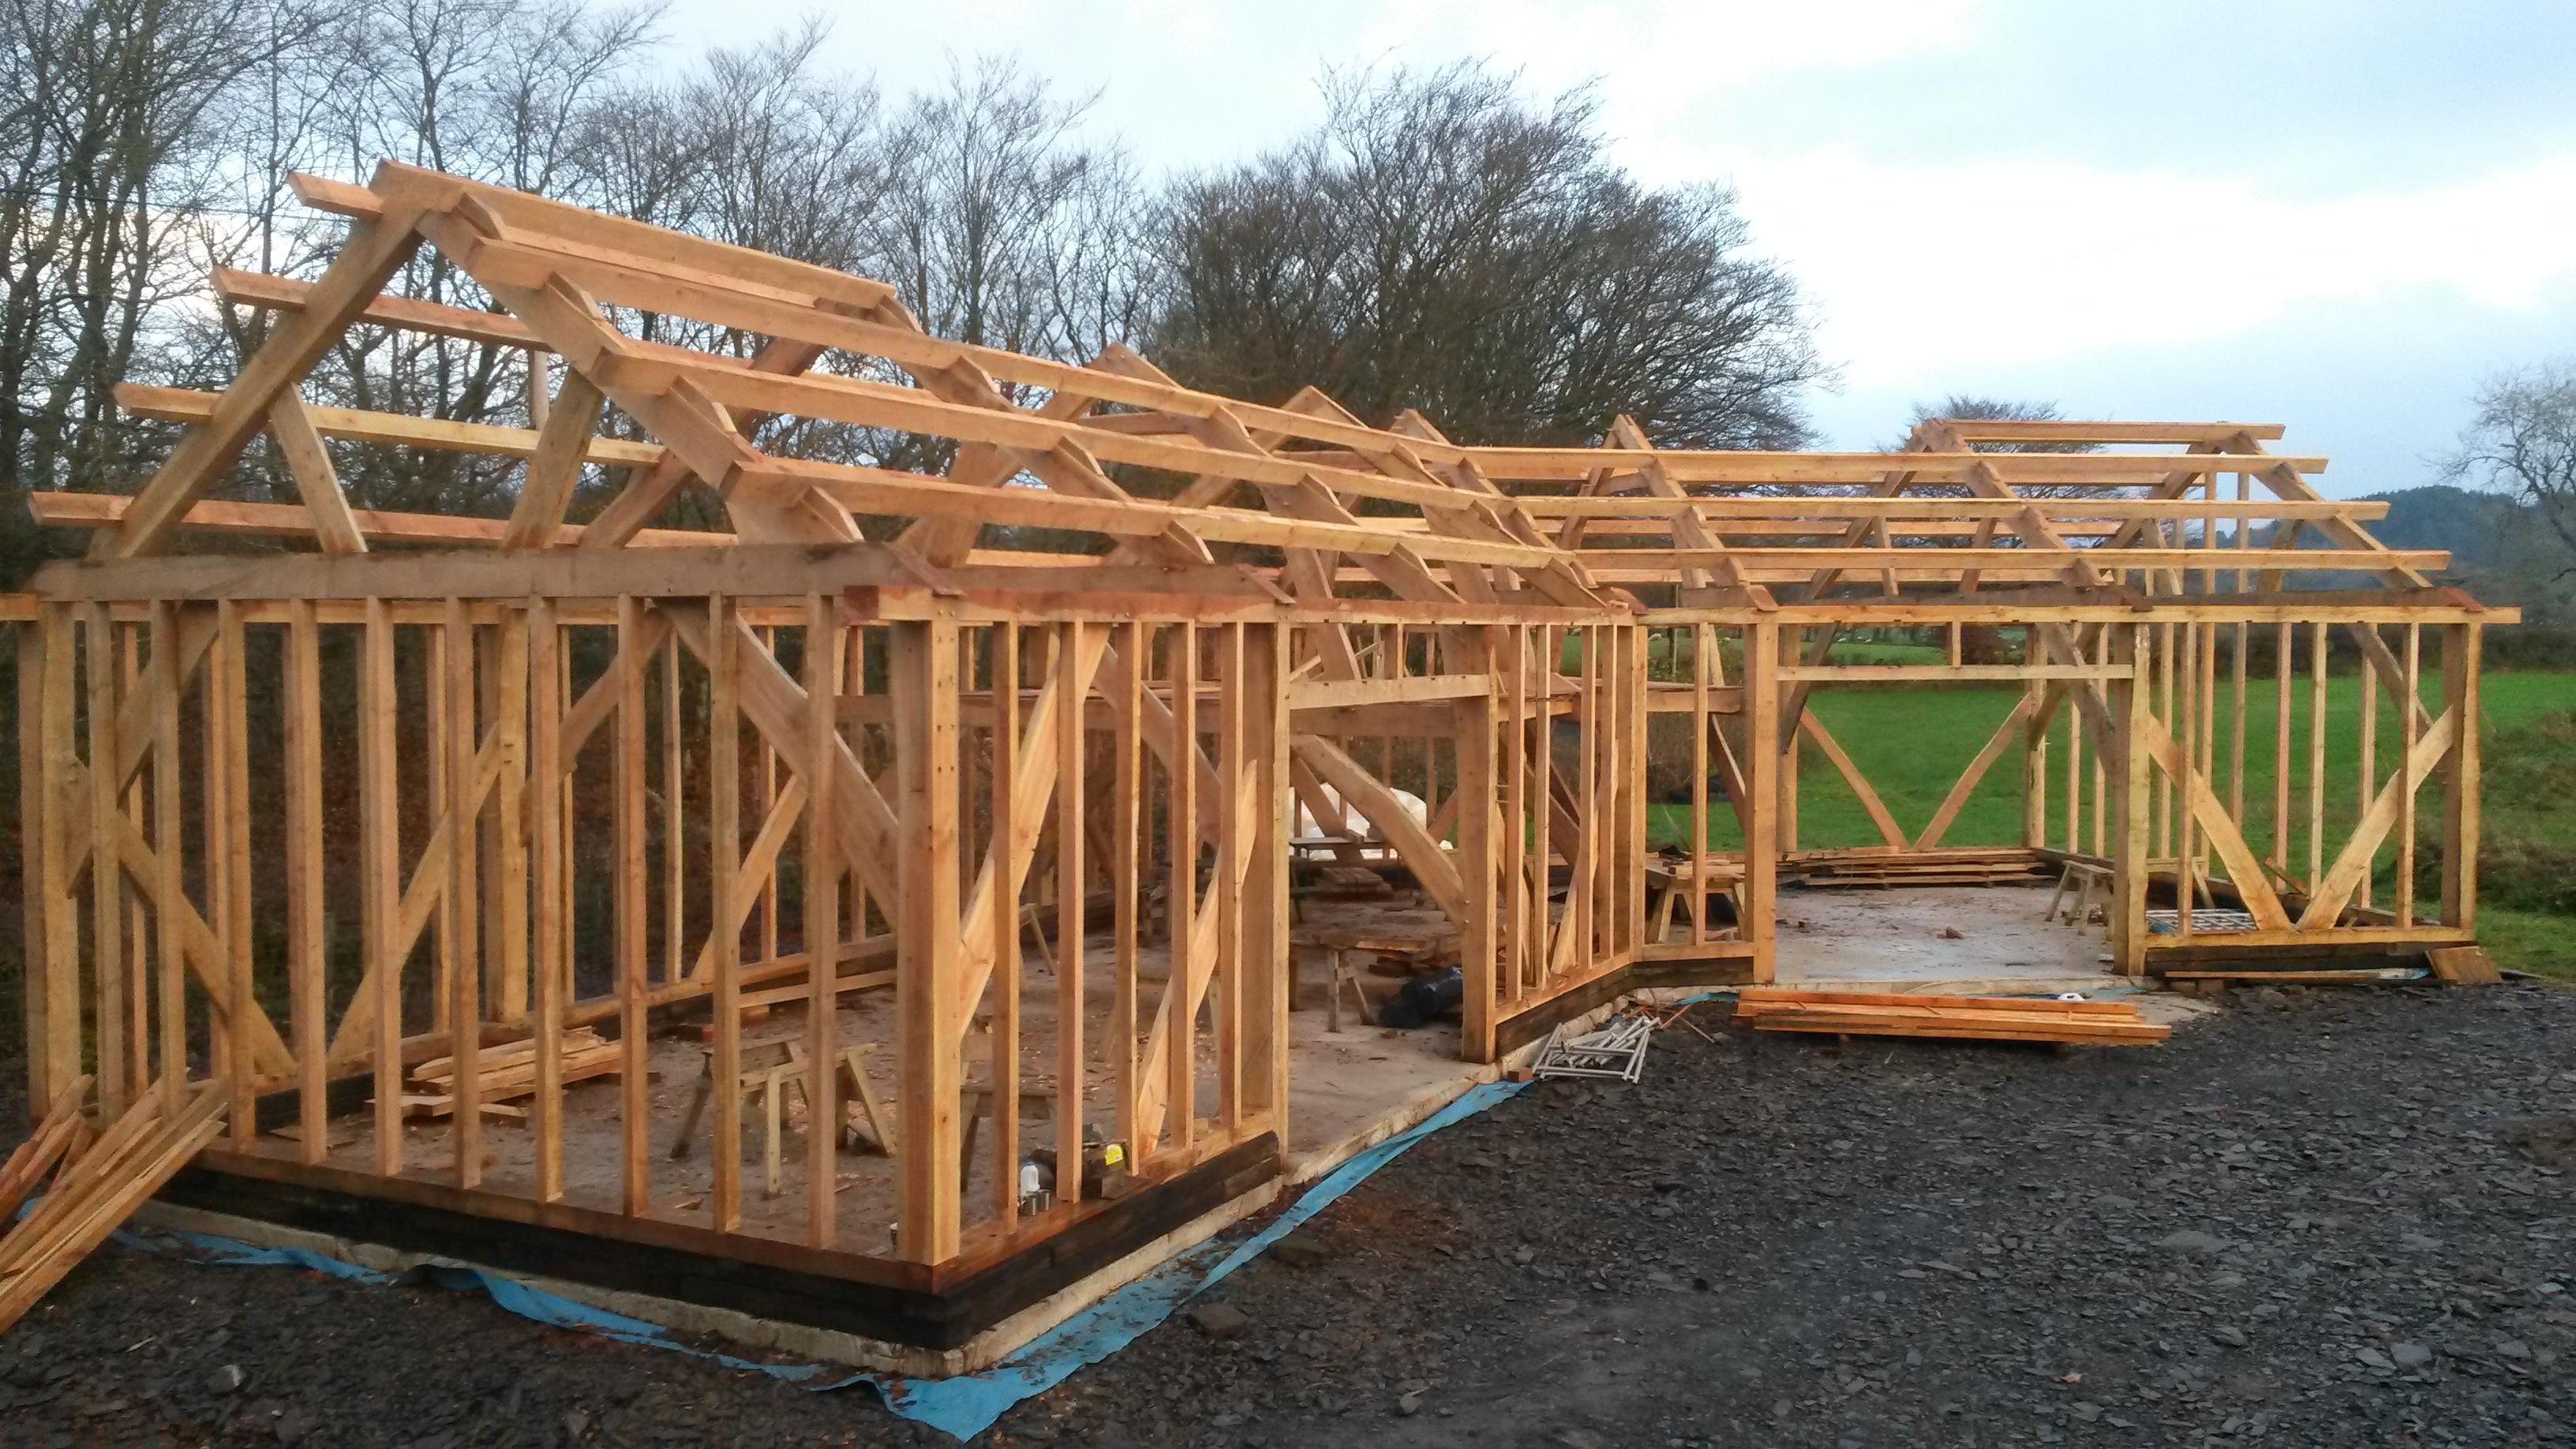 Timber Frame Barn Building - The Yurt Farm